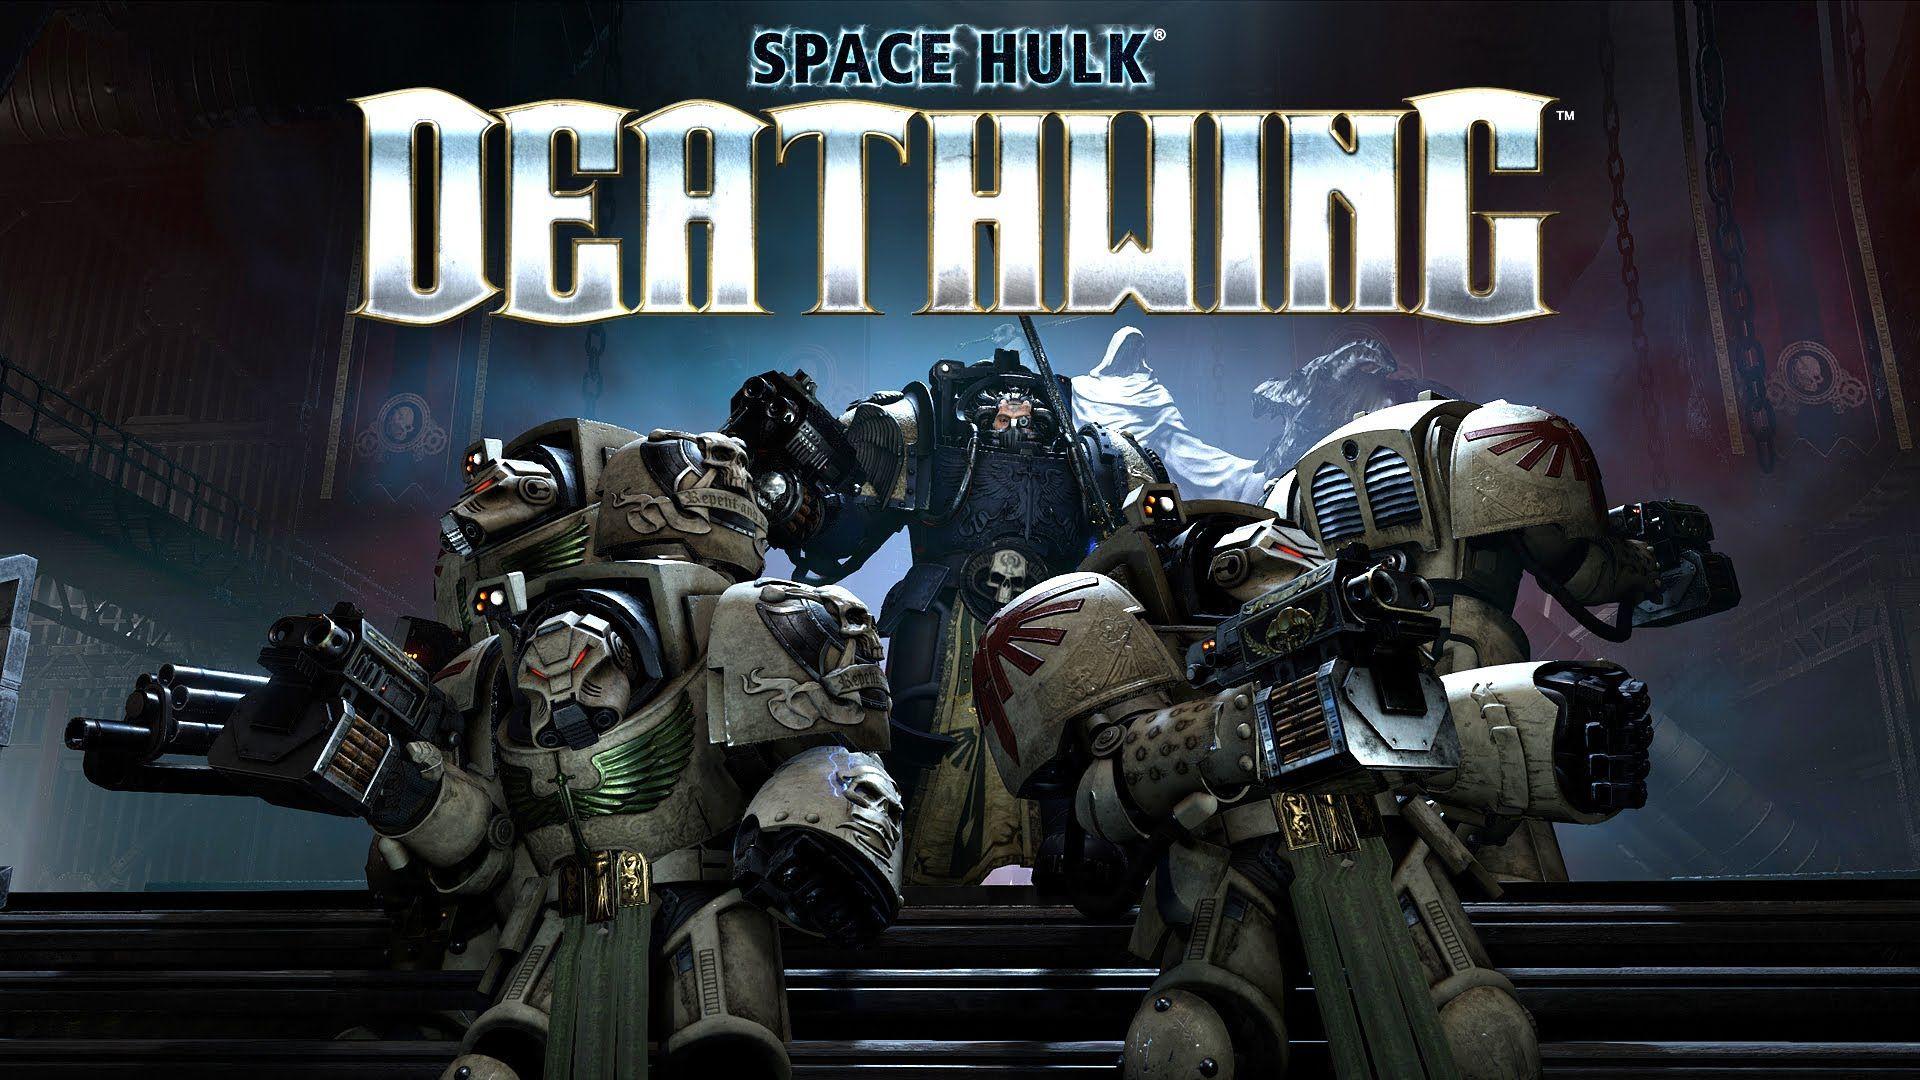 New Space Hulk Deathwing Trailer Space hulk deathwing